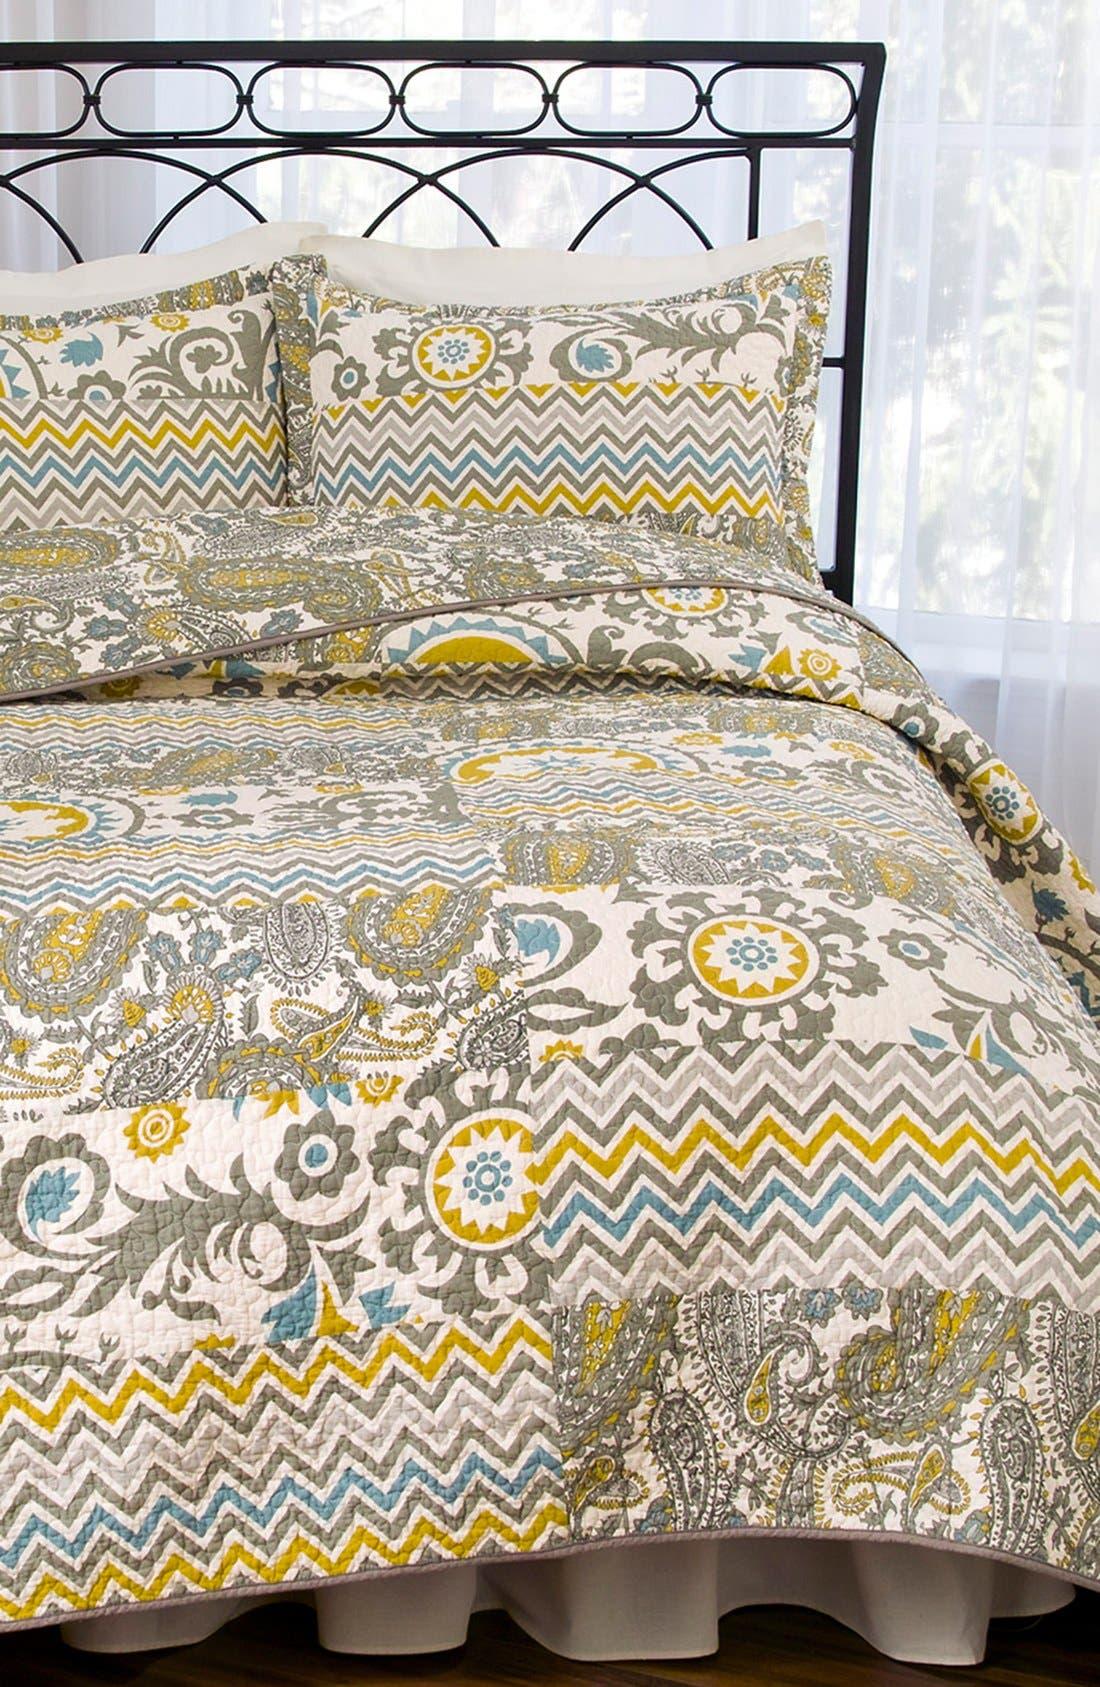 HEDAYA HOME FASHIONS,                             'Verano' Quilt,                             Alternate thumbnail 2, color,                             020